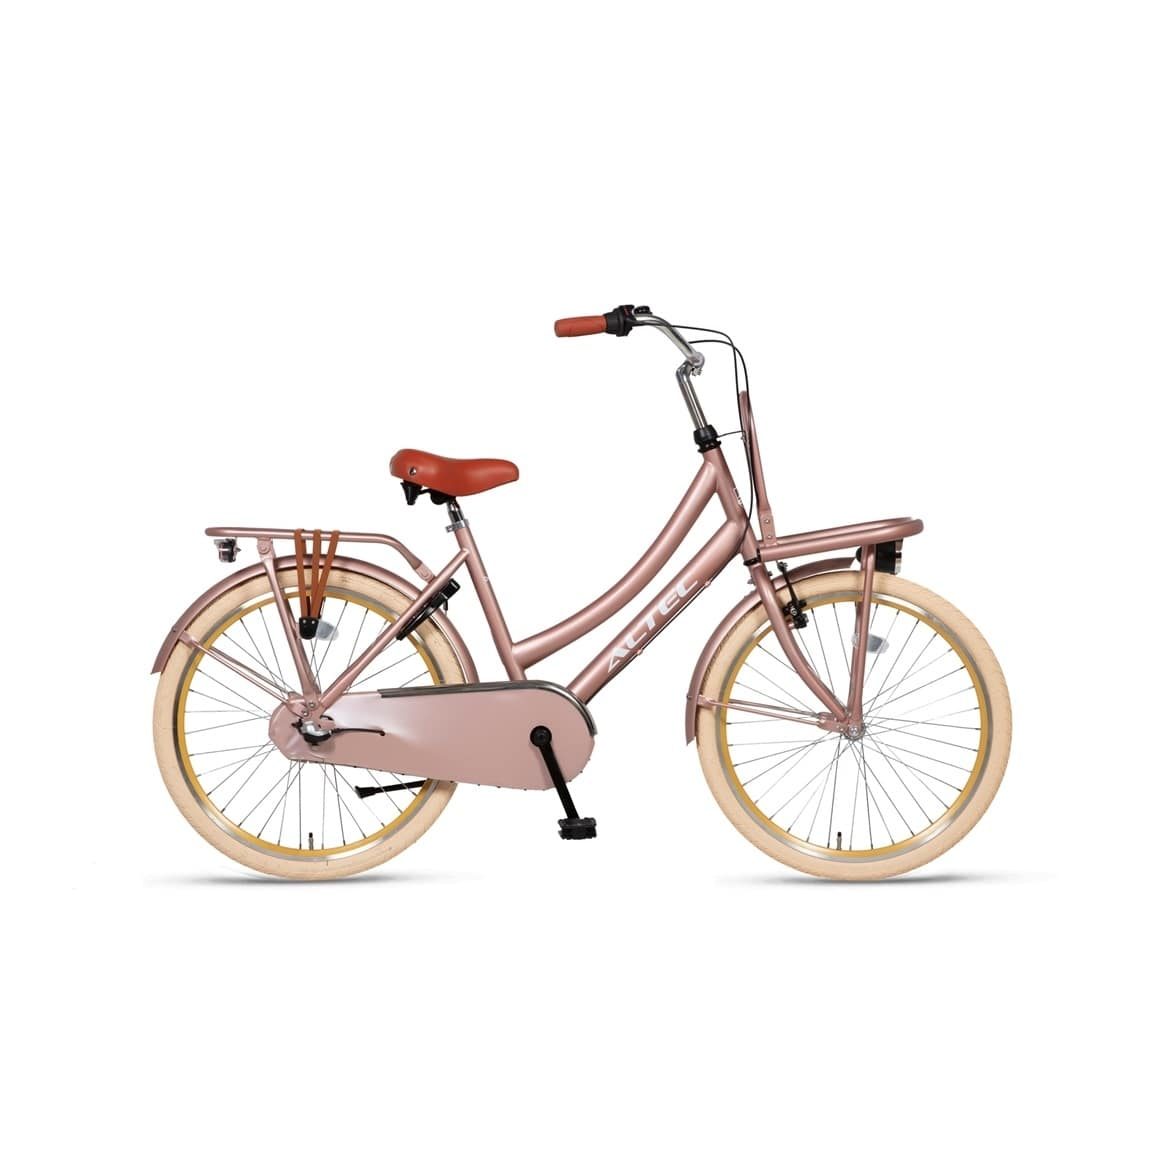 Altec-Dutch-24inch-Transportfiets-Lavender-Nieuw-2019-min